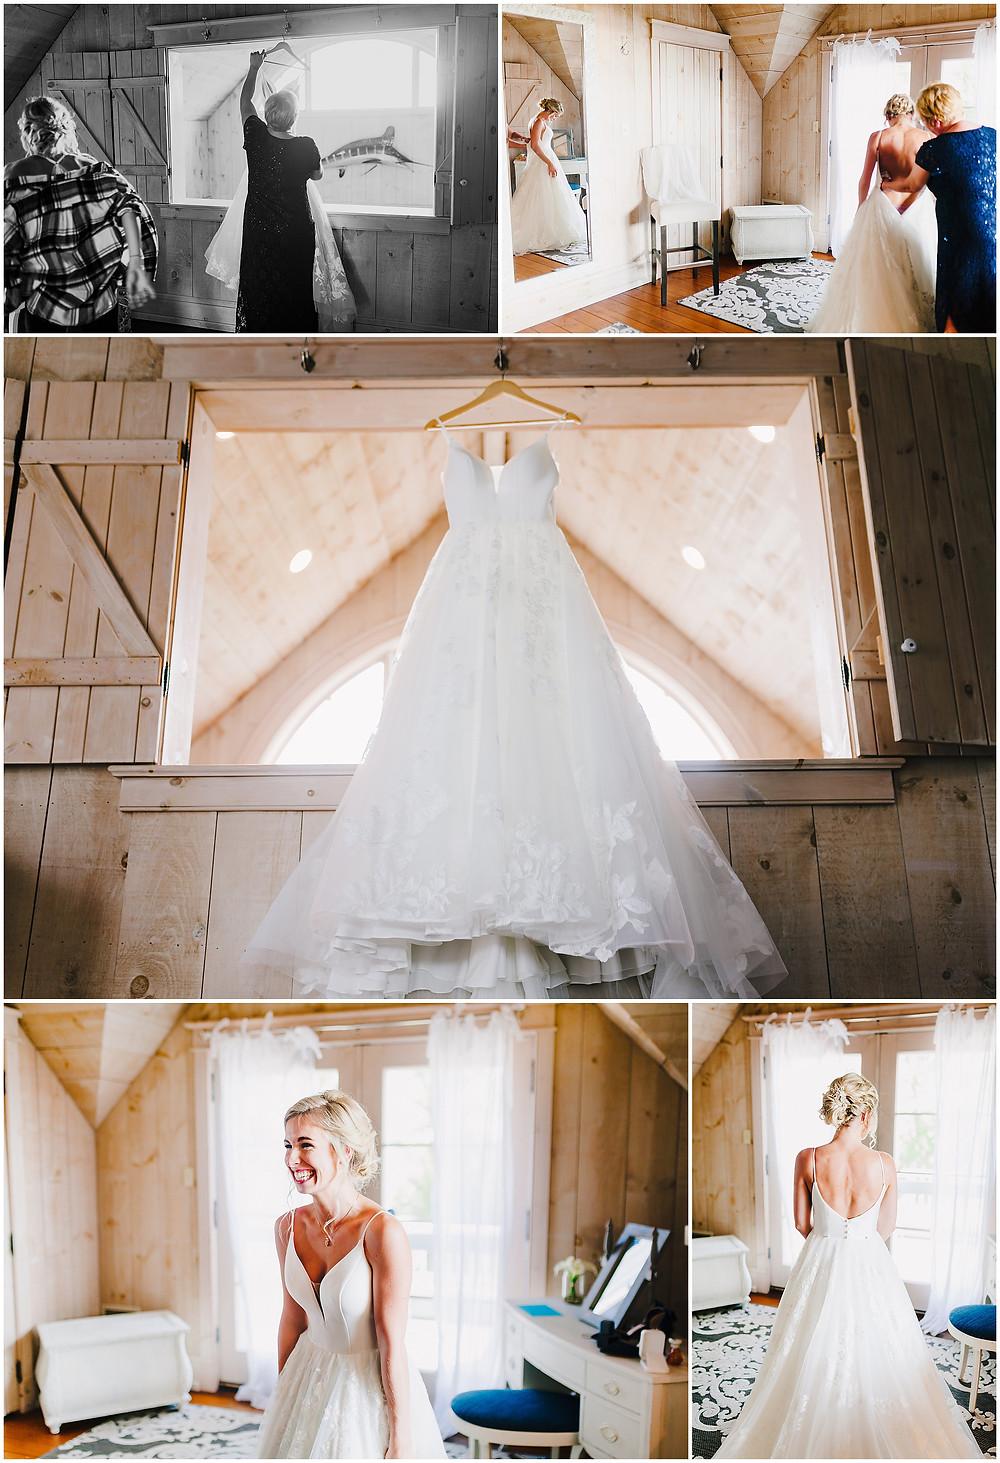 Bride Getting ready space - Bohemia Overlook Wedding Beach Venue